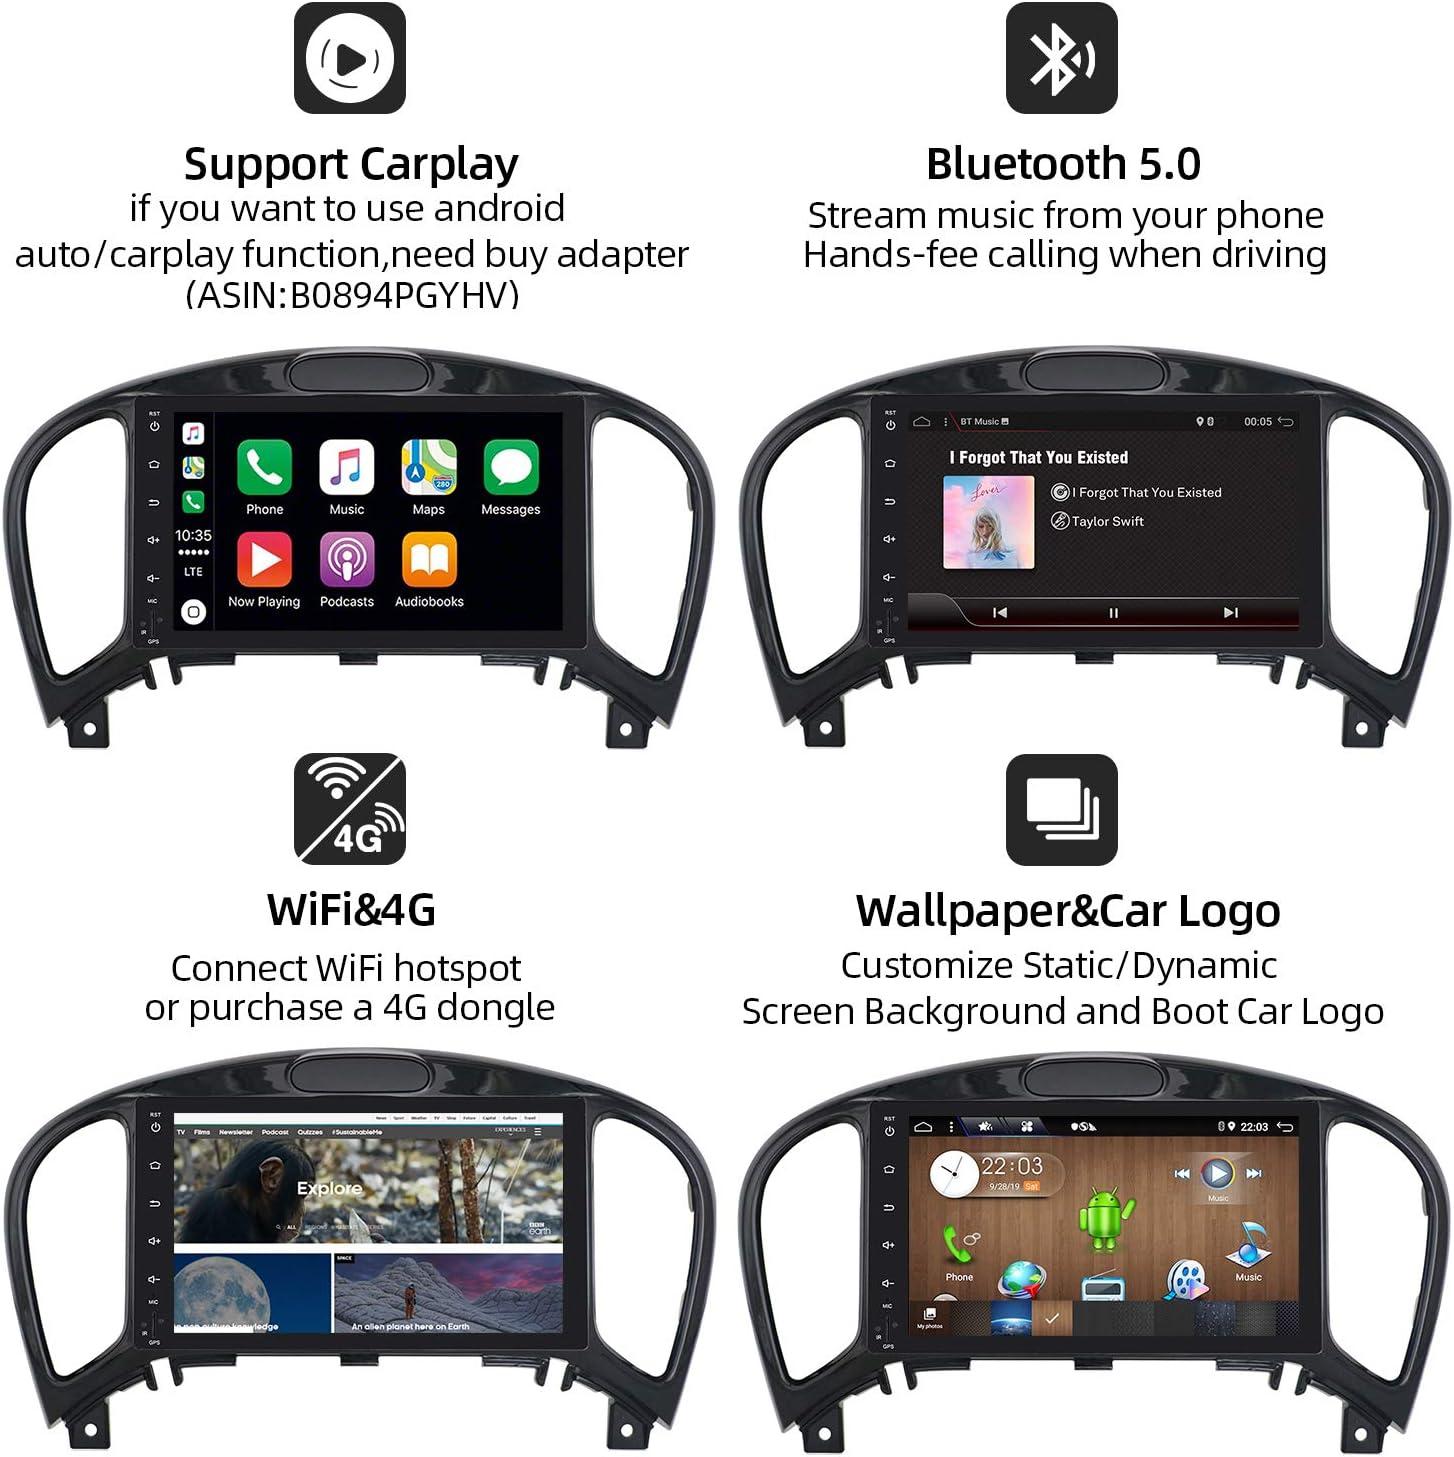 2011-2017 2010-2014 YF15 Infiniti ESQ KOSTENLOSE R/ückfahrkamera- Unterst/ützung DAB - GPS 2 Din YUNTX Android 10 Autoradio Passt f/ür Nissan Juke // Lenkradsteuerung //4G//WiFi//Bluetooth//Mirrorlink